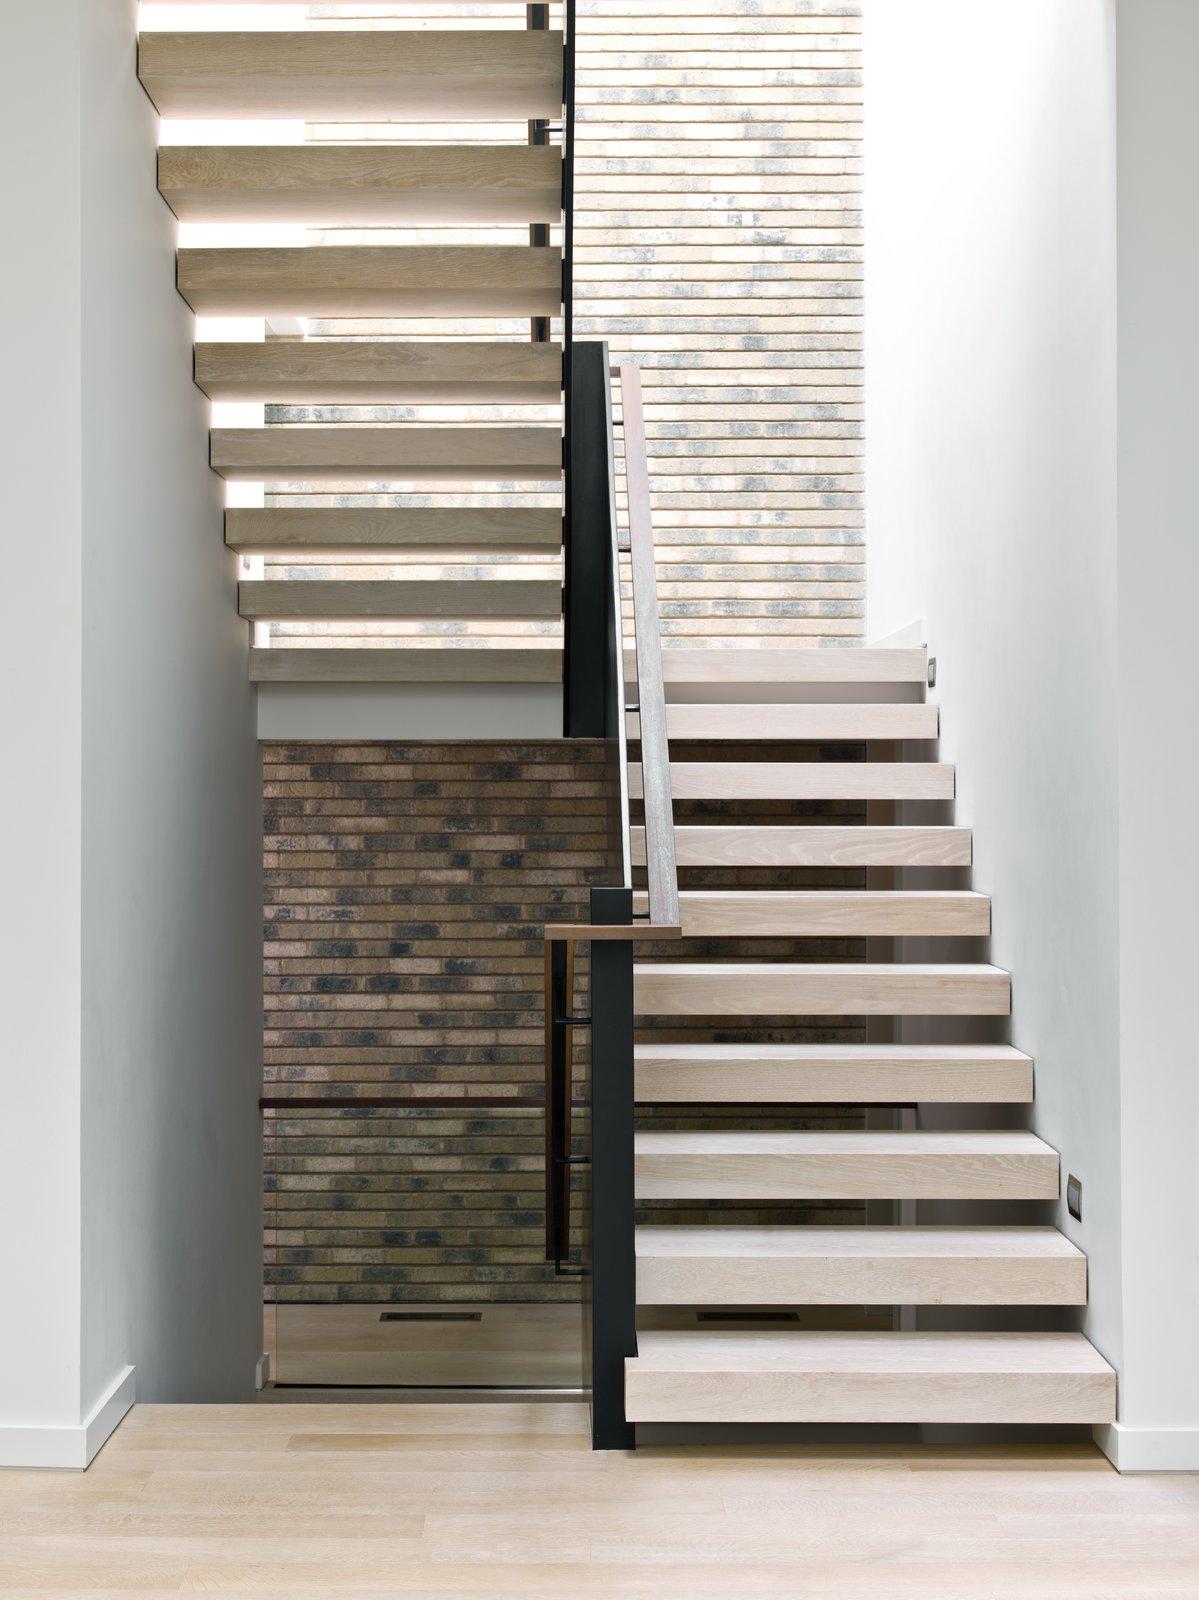 Staircase, Metal Railing, Wood Tread, and Wood Railing  Eastwood Residence by Searl Lamaster Howe